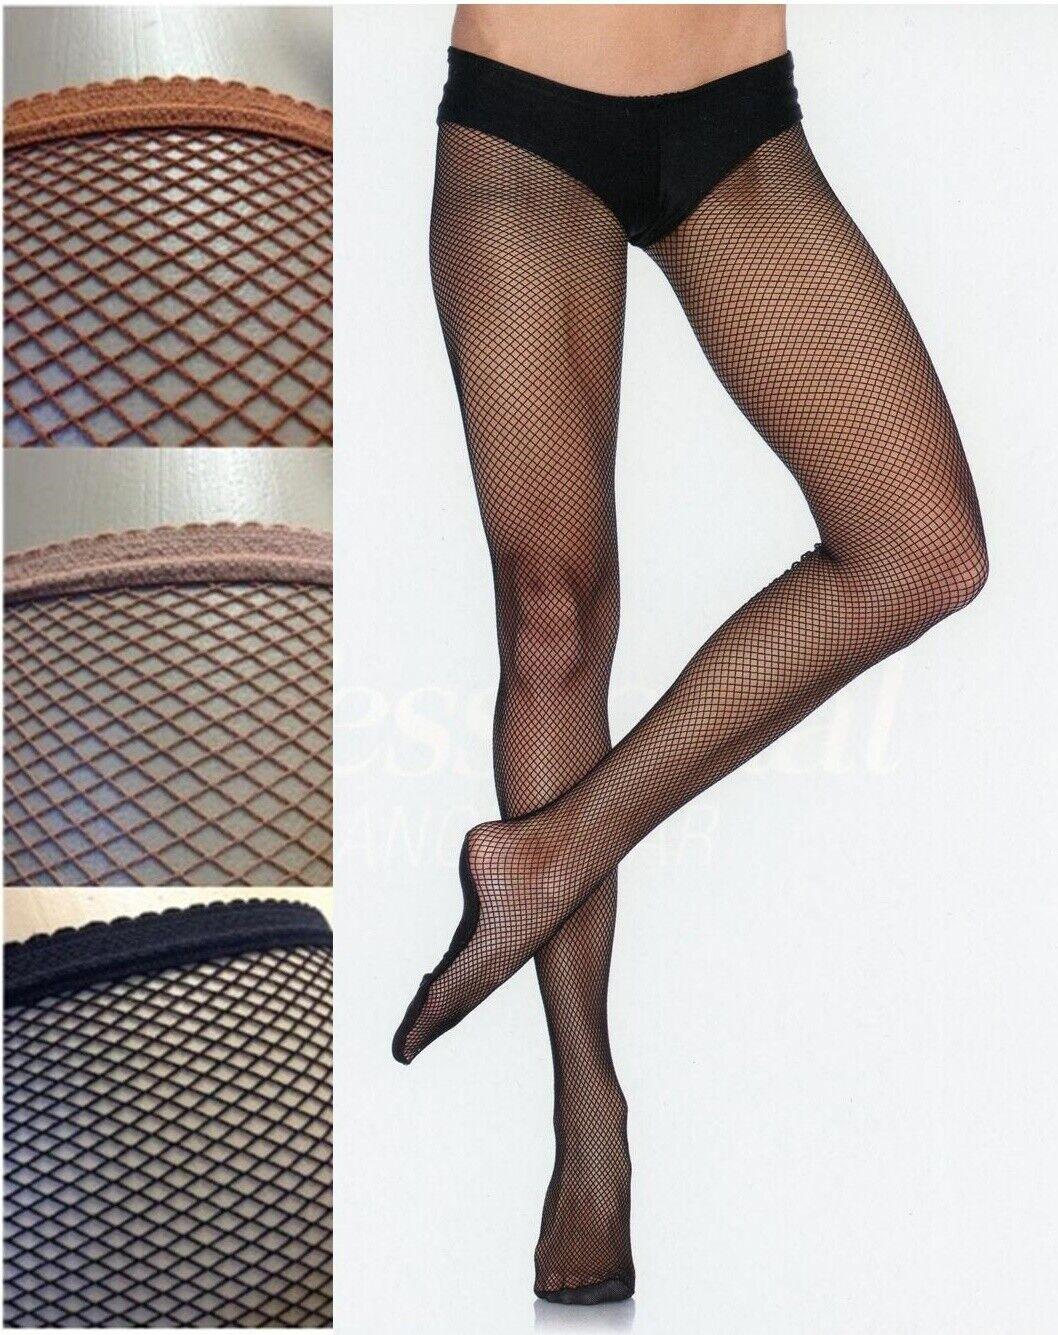 Pro Dancer Tights Fishnet Size C/D Black Suntan Lt Toast Leg Avenue PD801